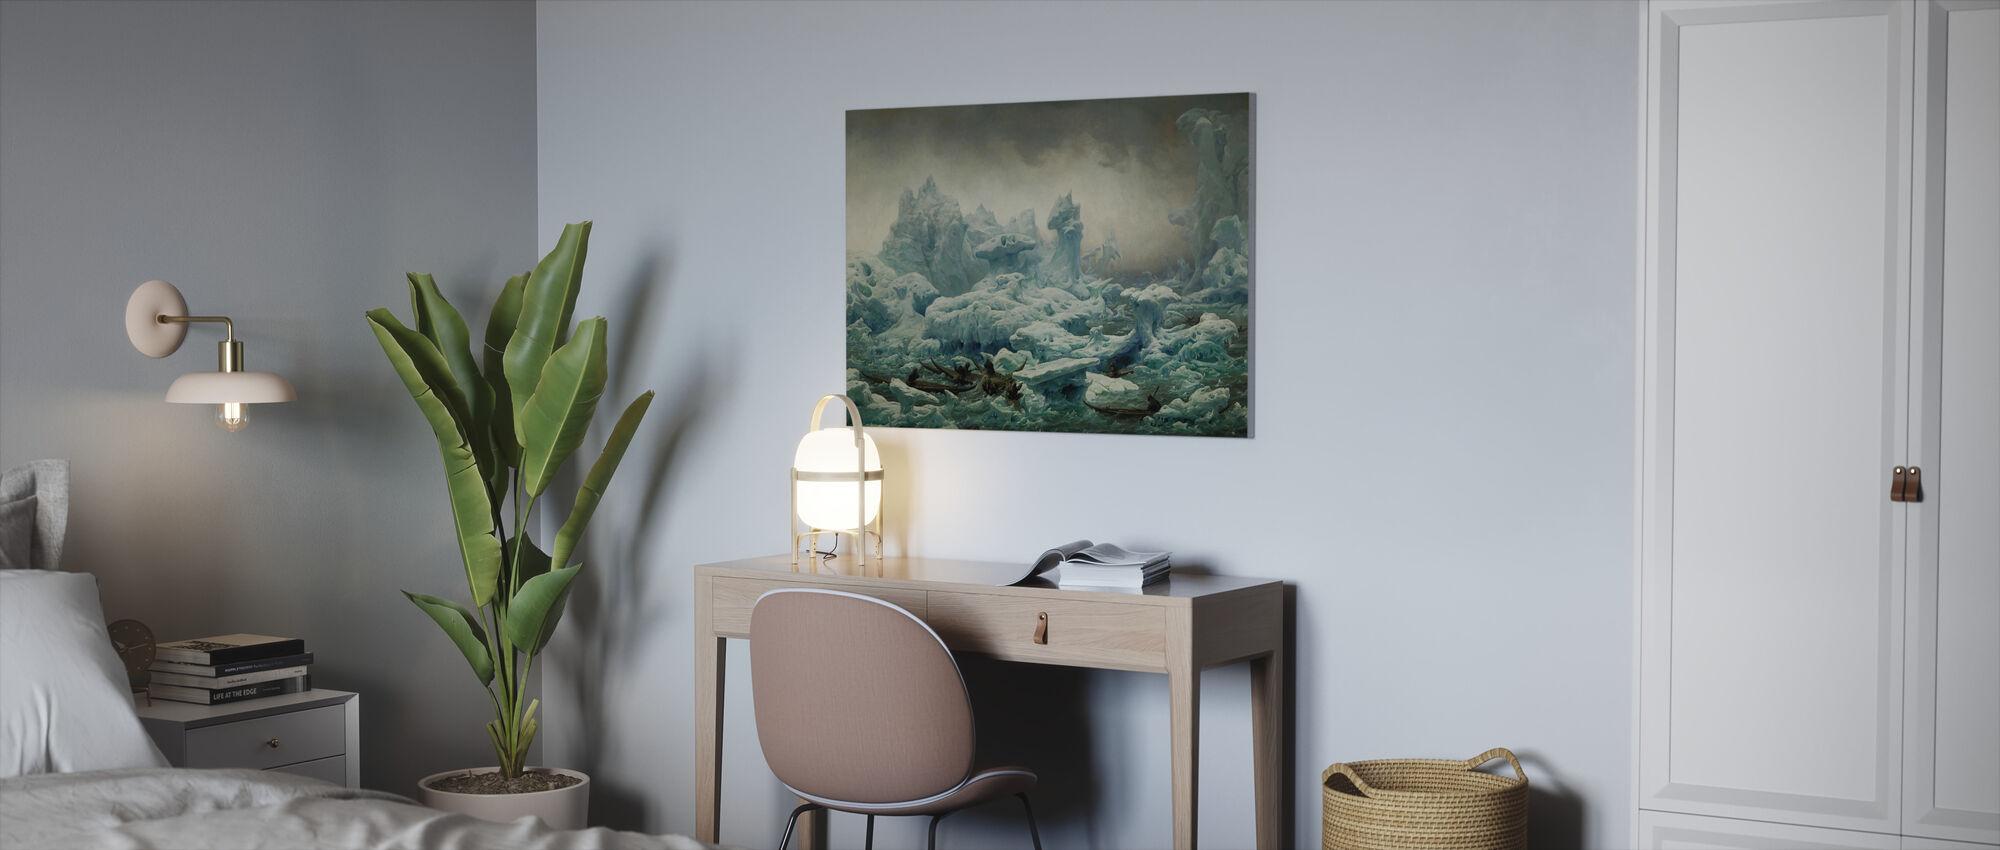 Greenlanders Hunting Walrus - Canvas print - Office